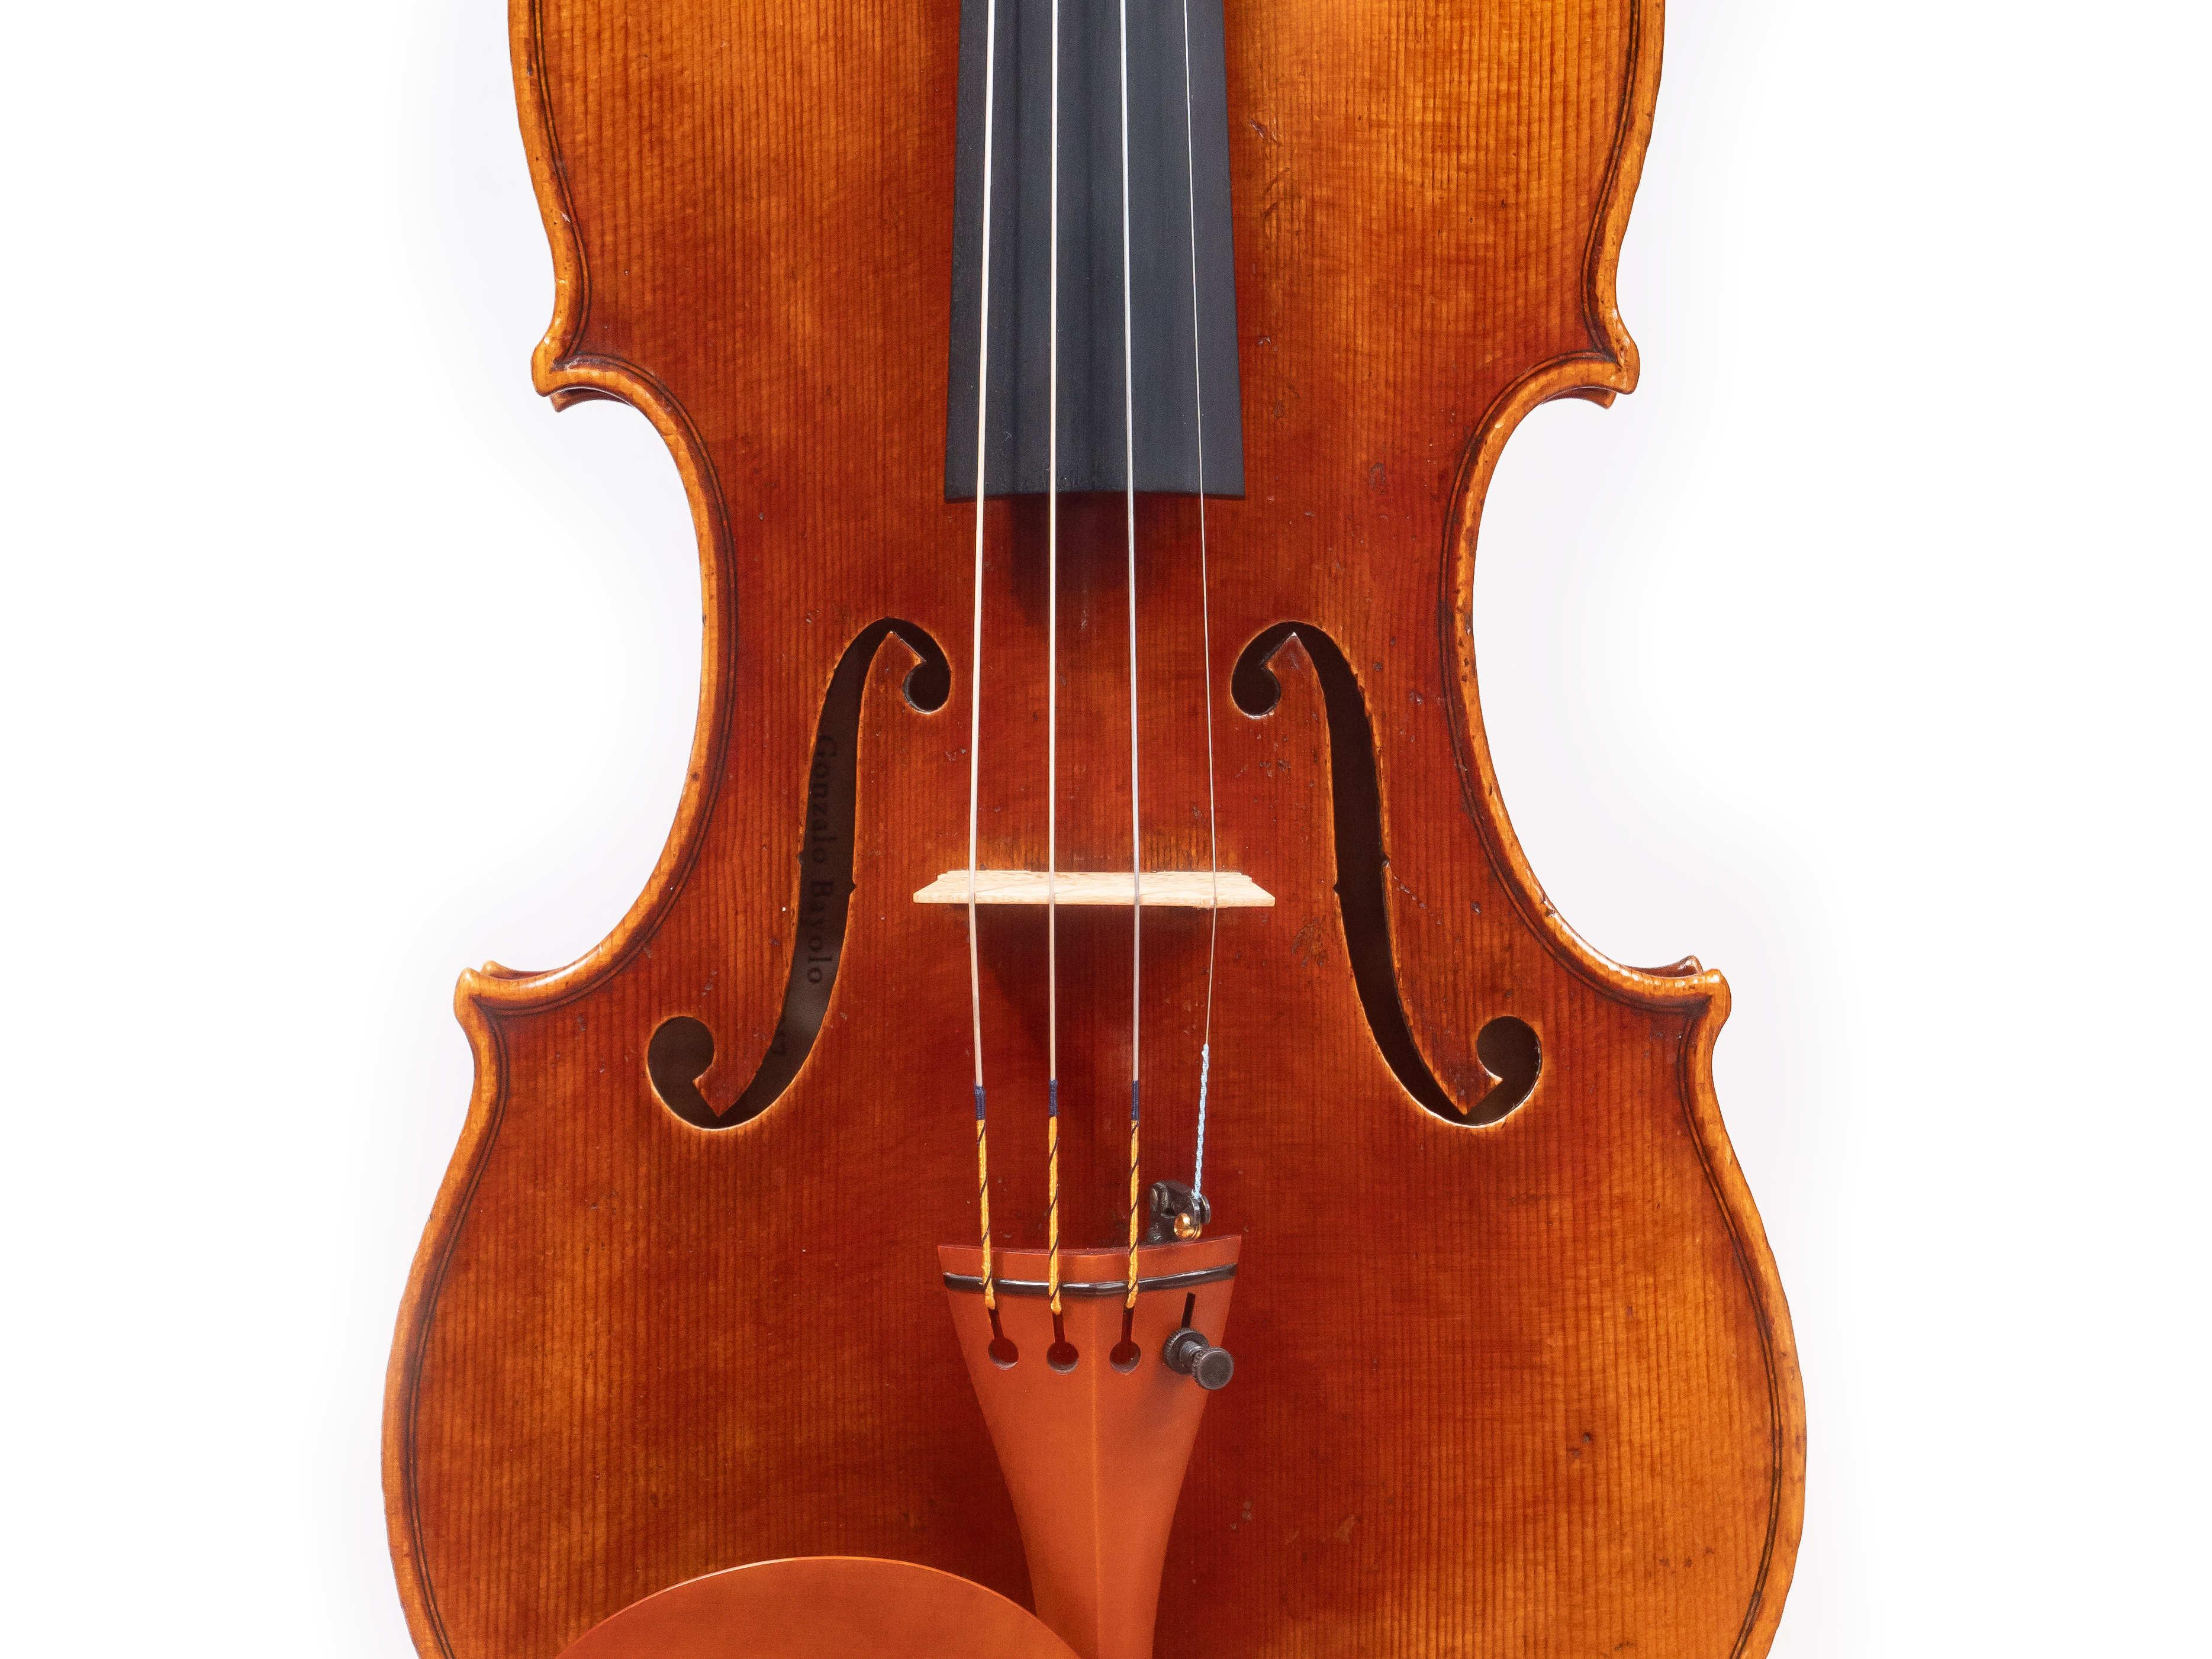 bayolo violin